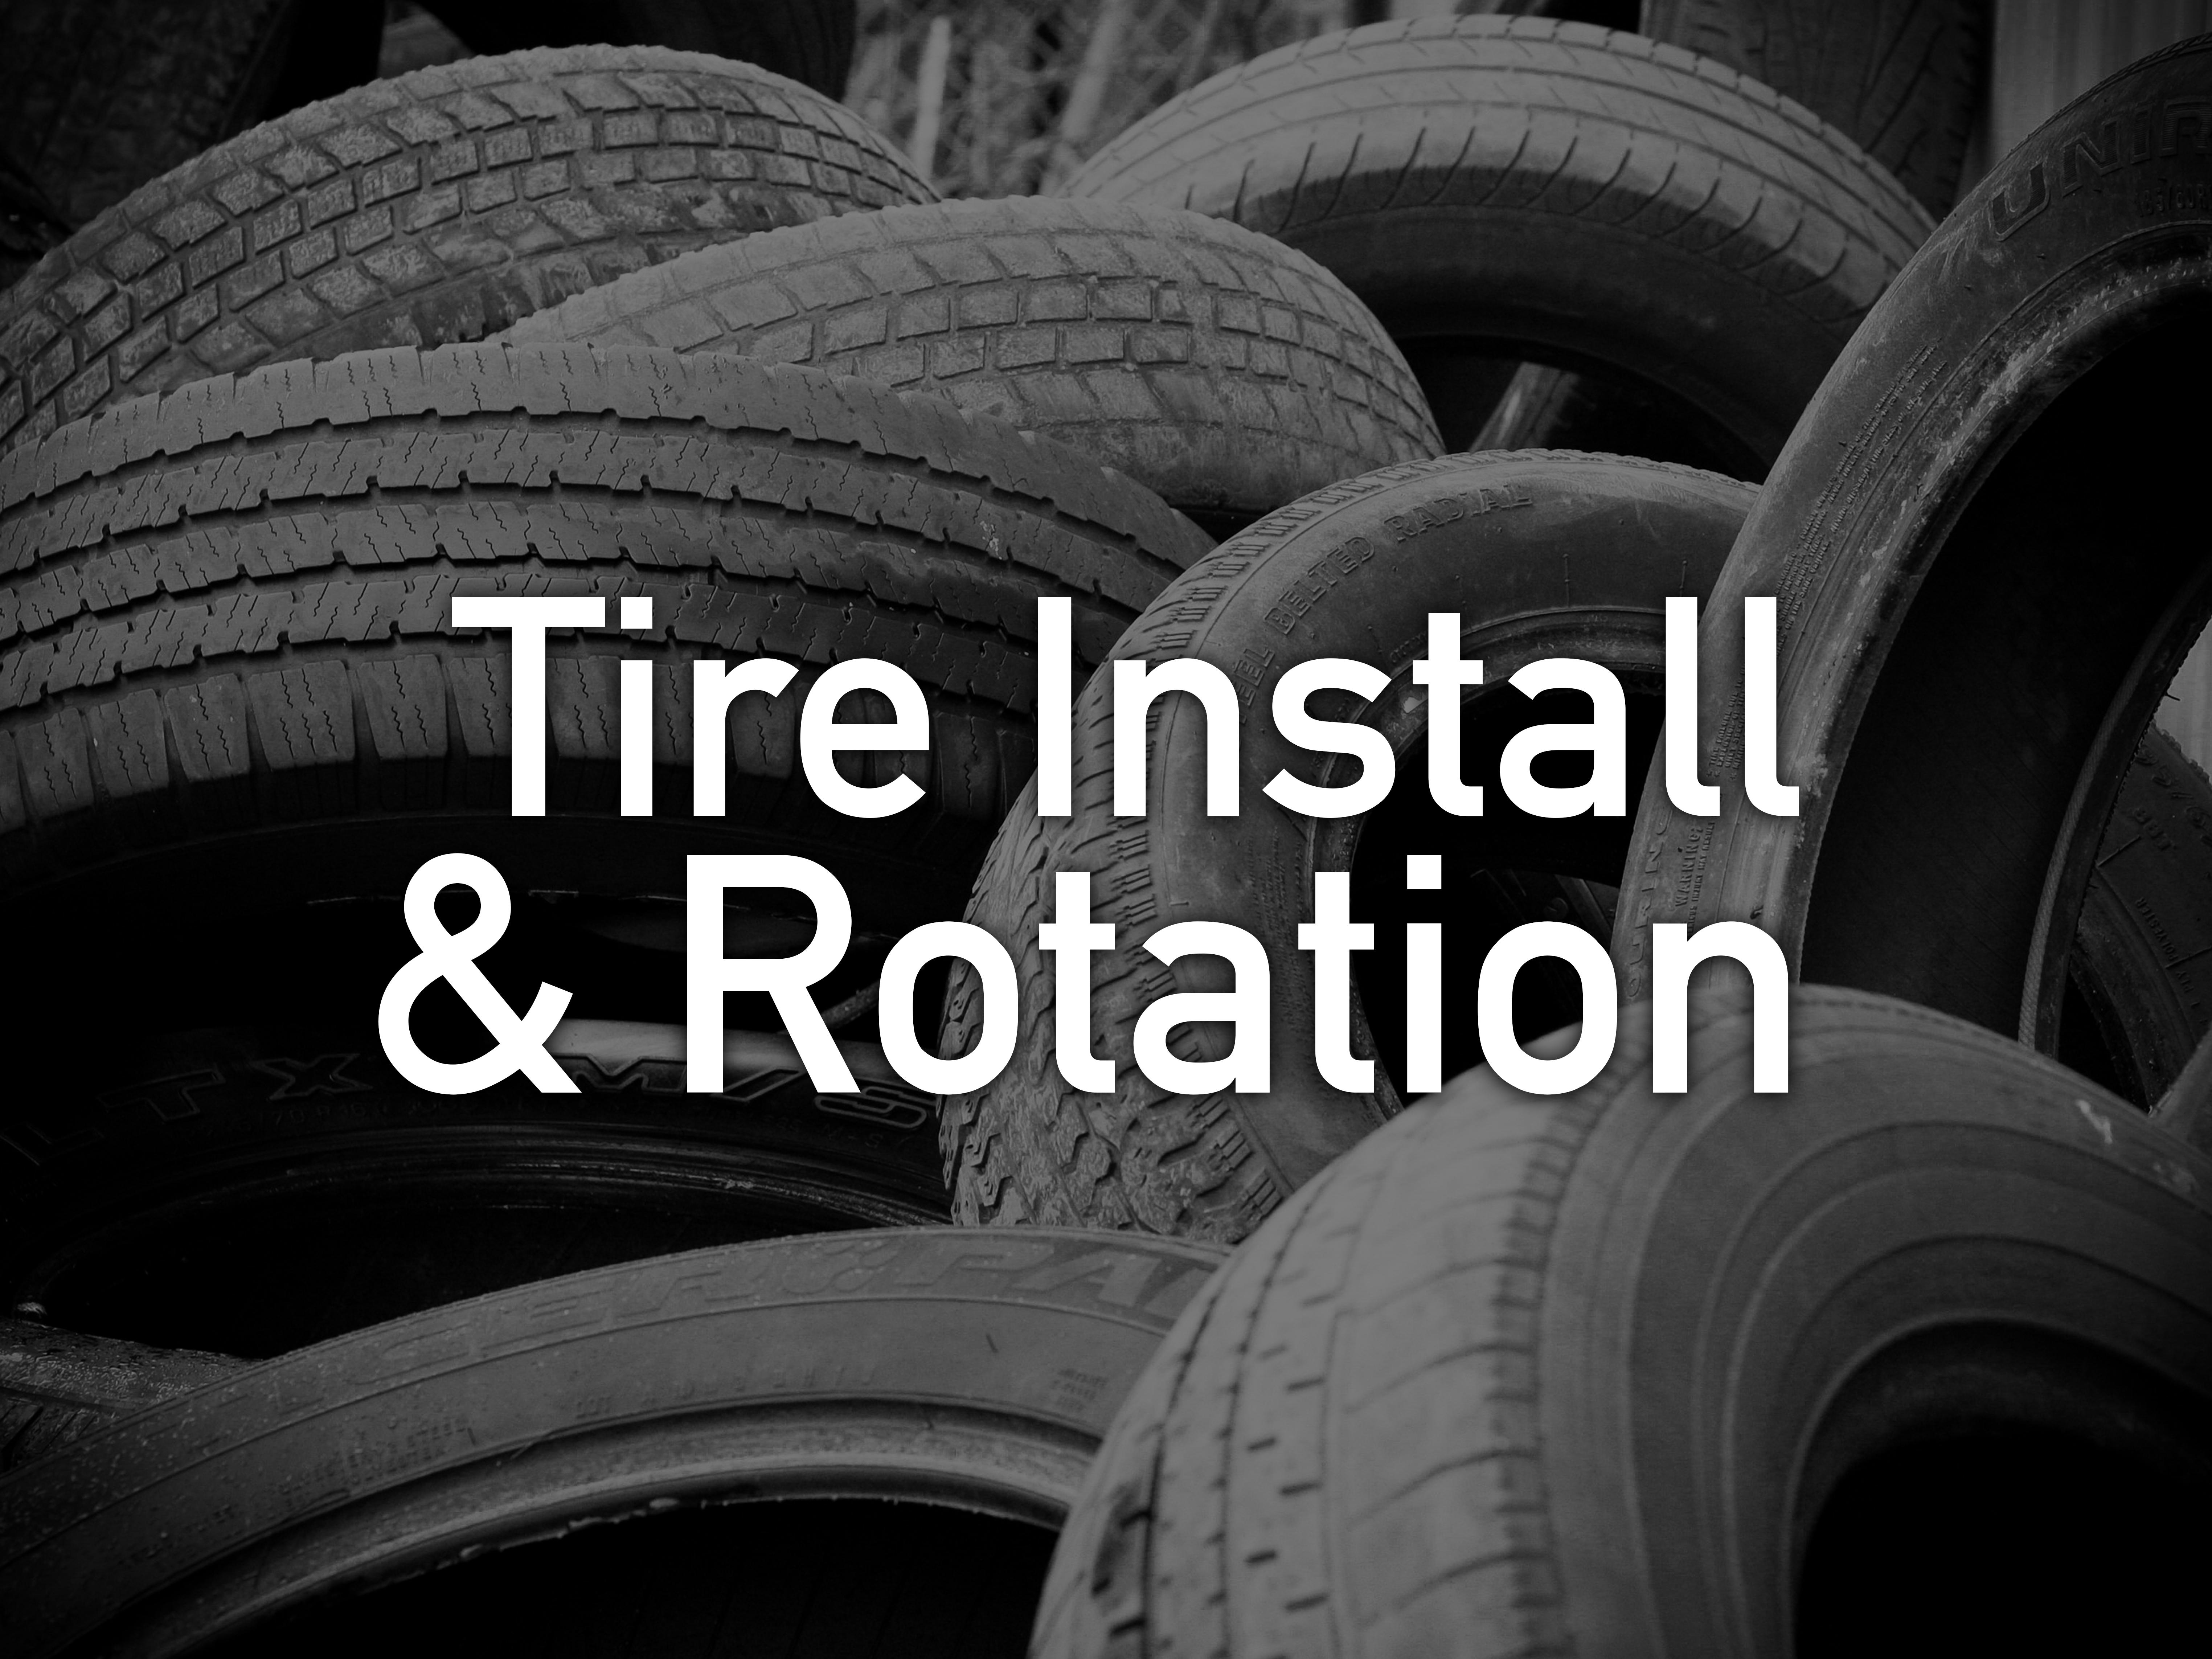 tire install